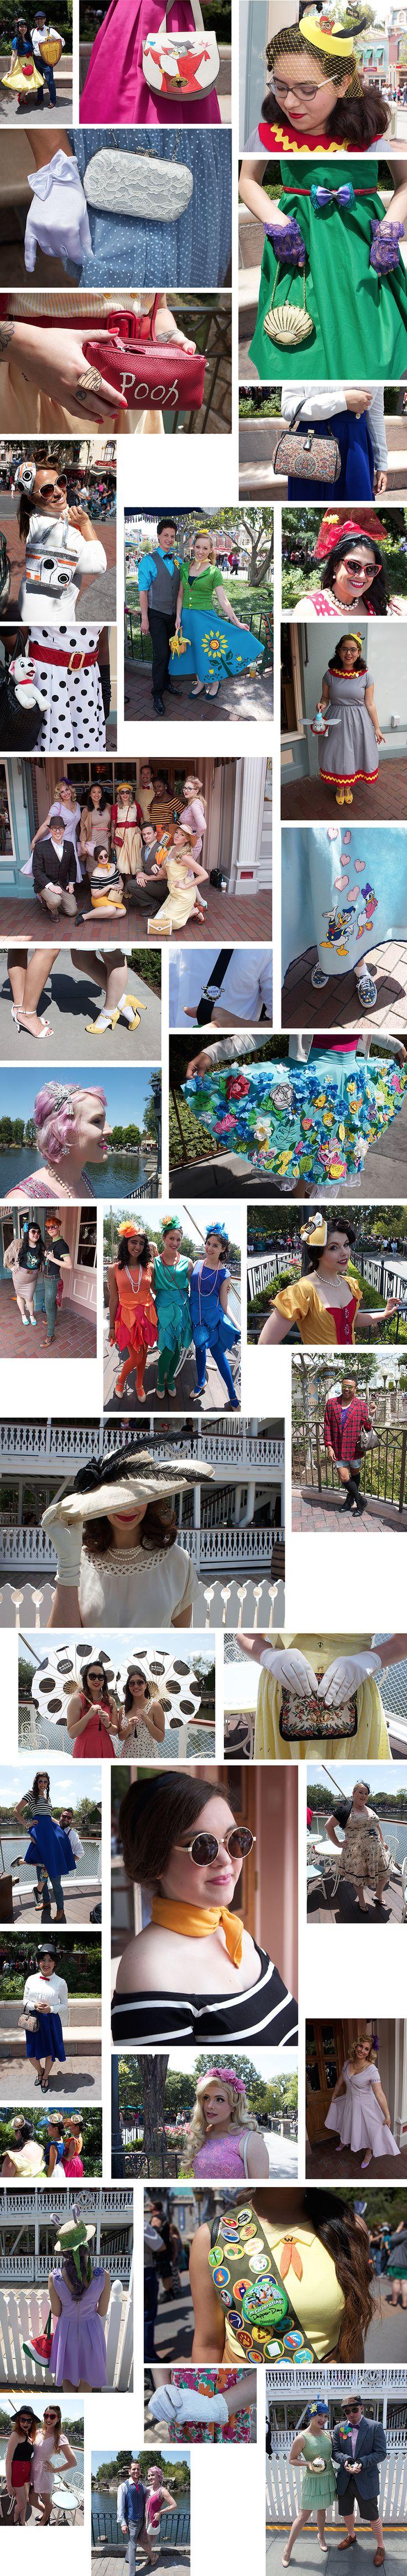 Bing Bong and Joy Dapper Day Disney bounding  Street Style Dapper Day part 2